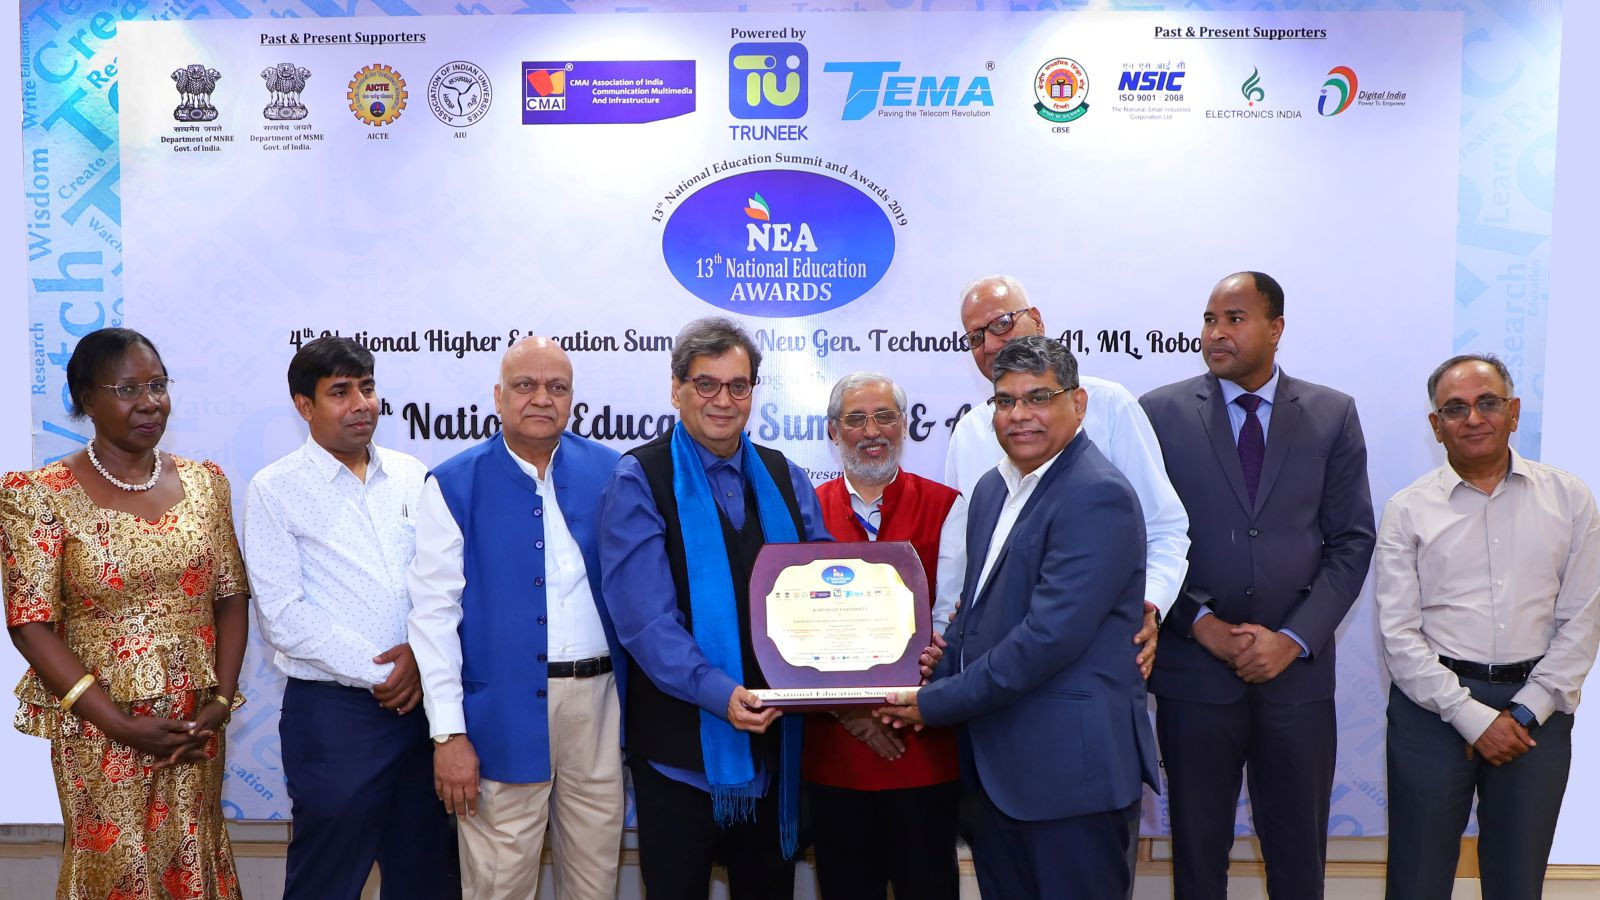 13th National Education & Summit Awards 2019 Image